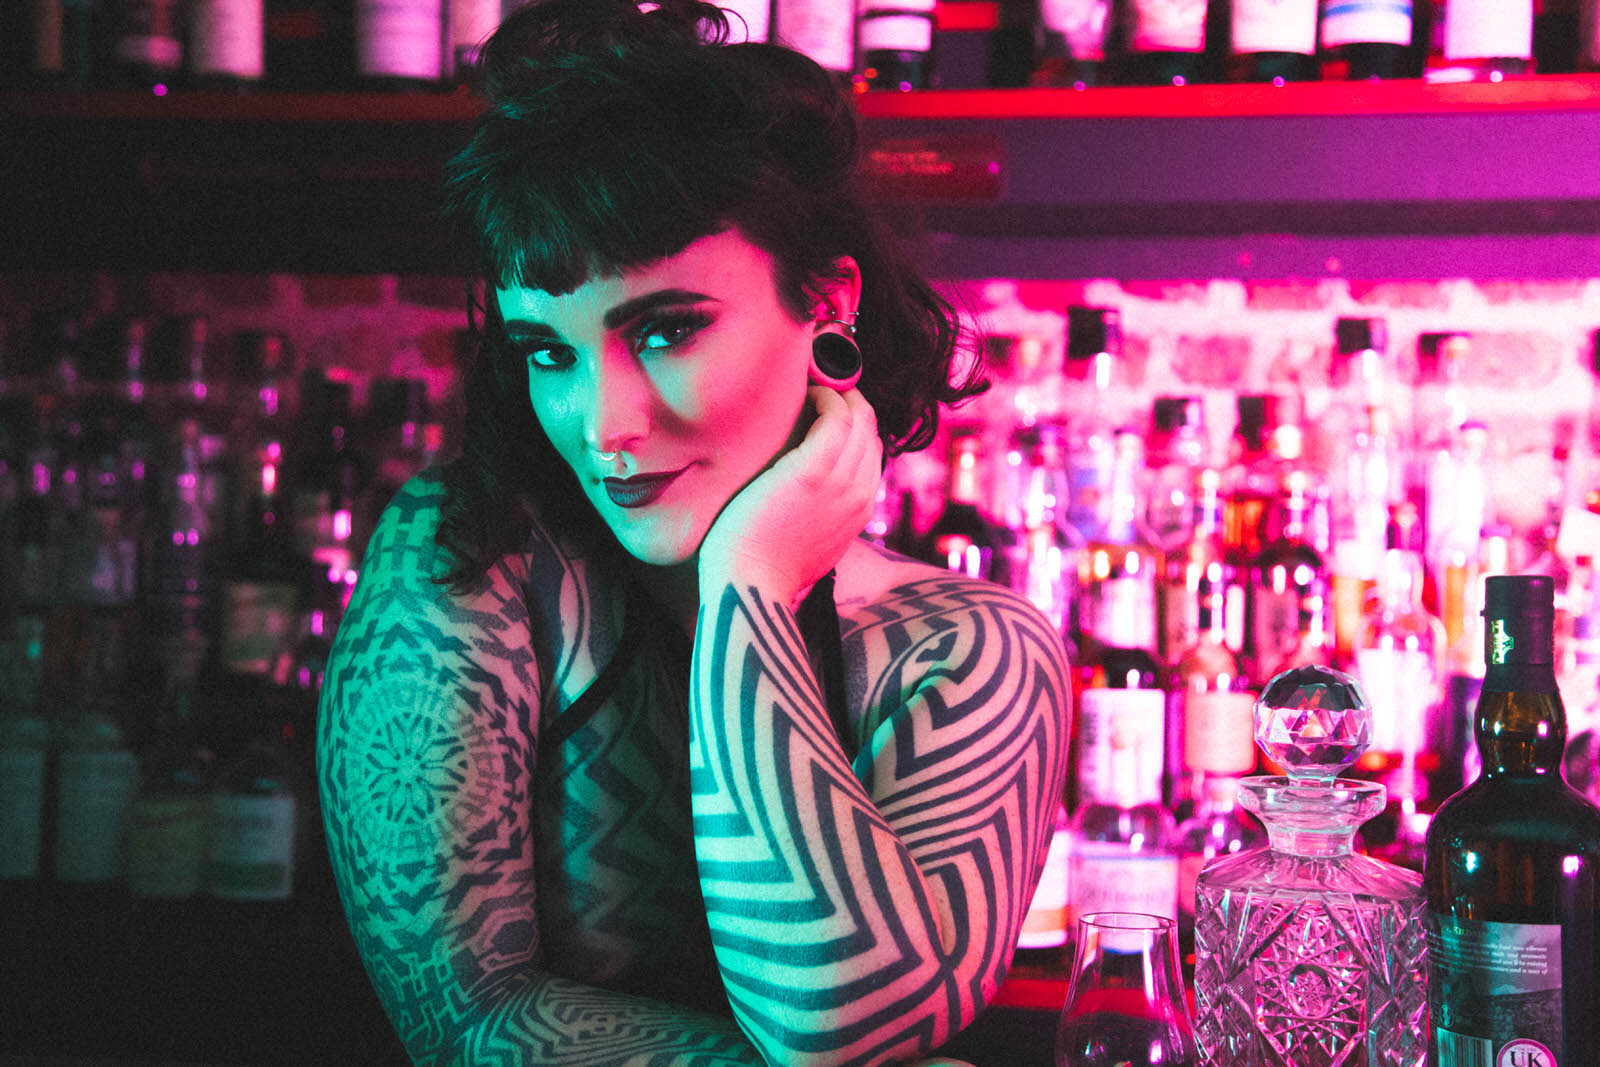 miss tallula whiskey tour sydney, whisky bar, whisky date, scotch whisky, whisky mistress